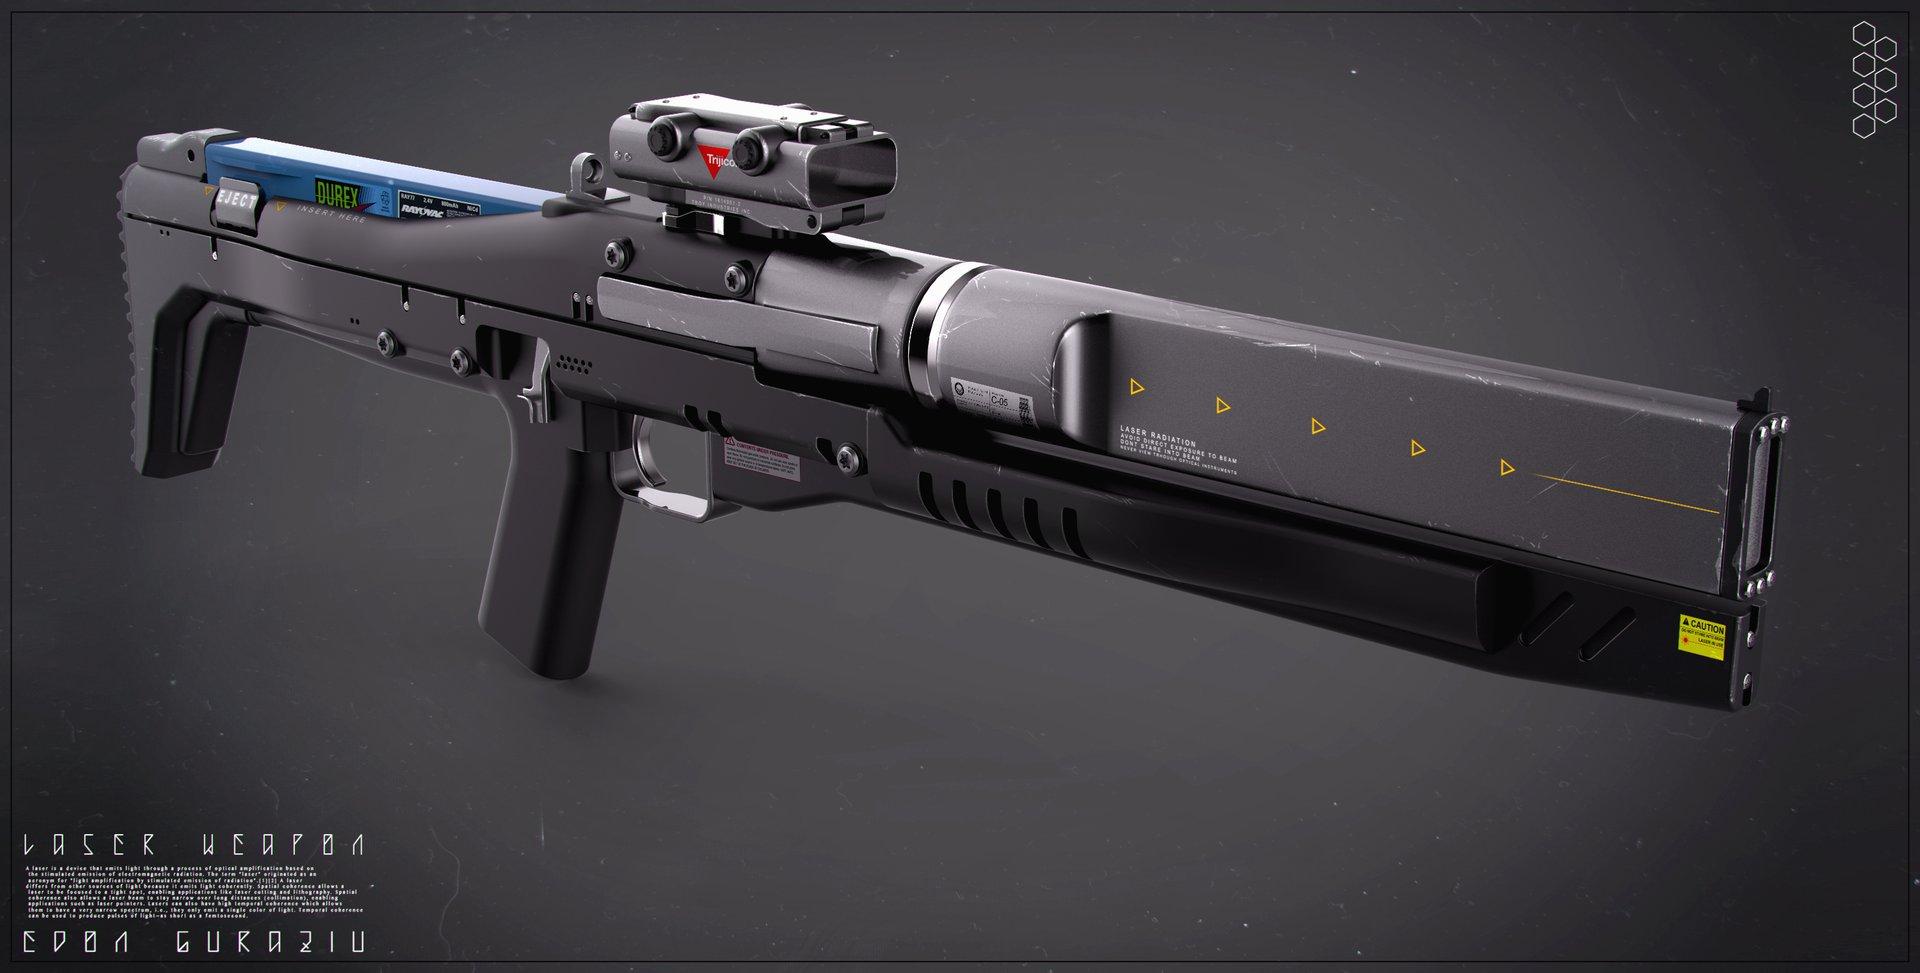 Edon Guraziu Future Weapon Concepts